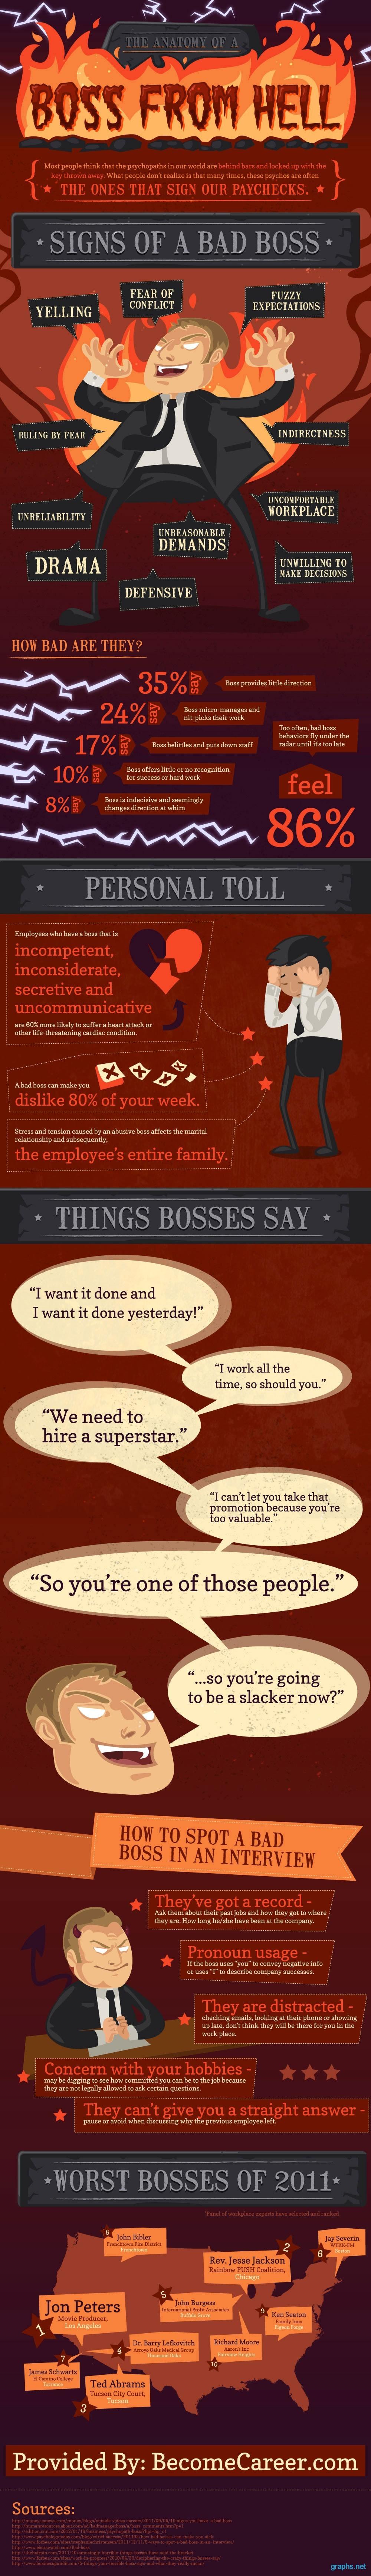 bad boss signs